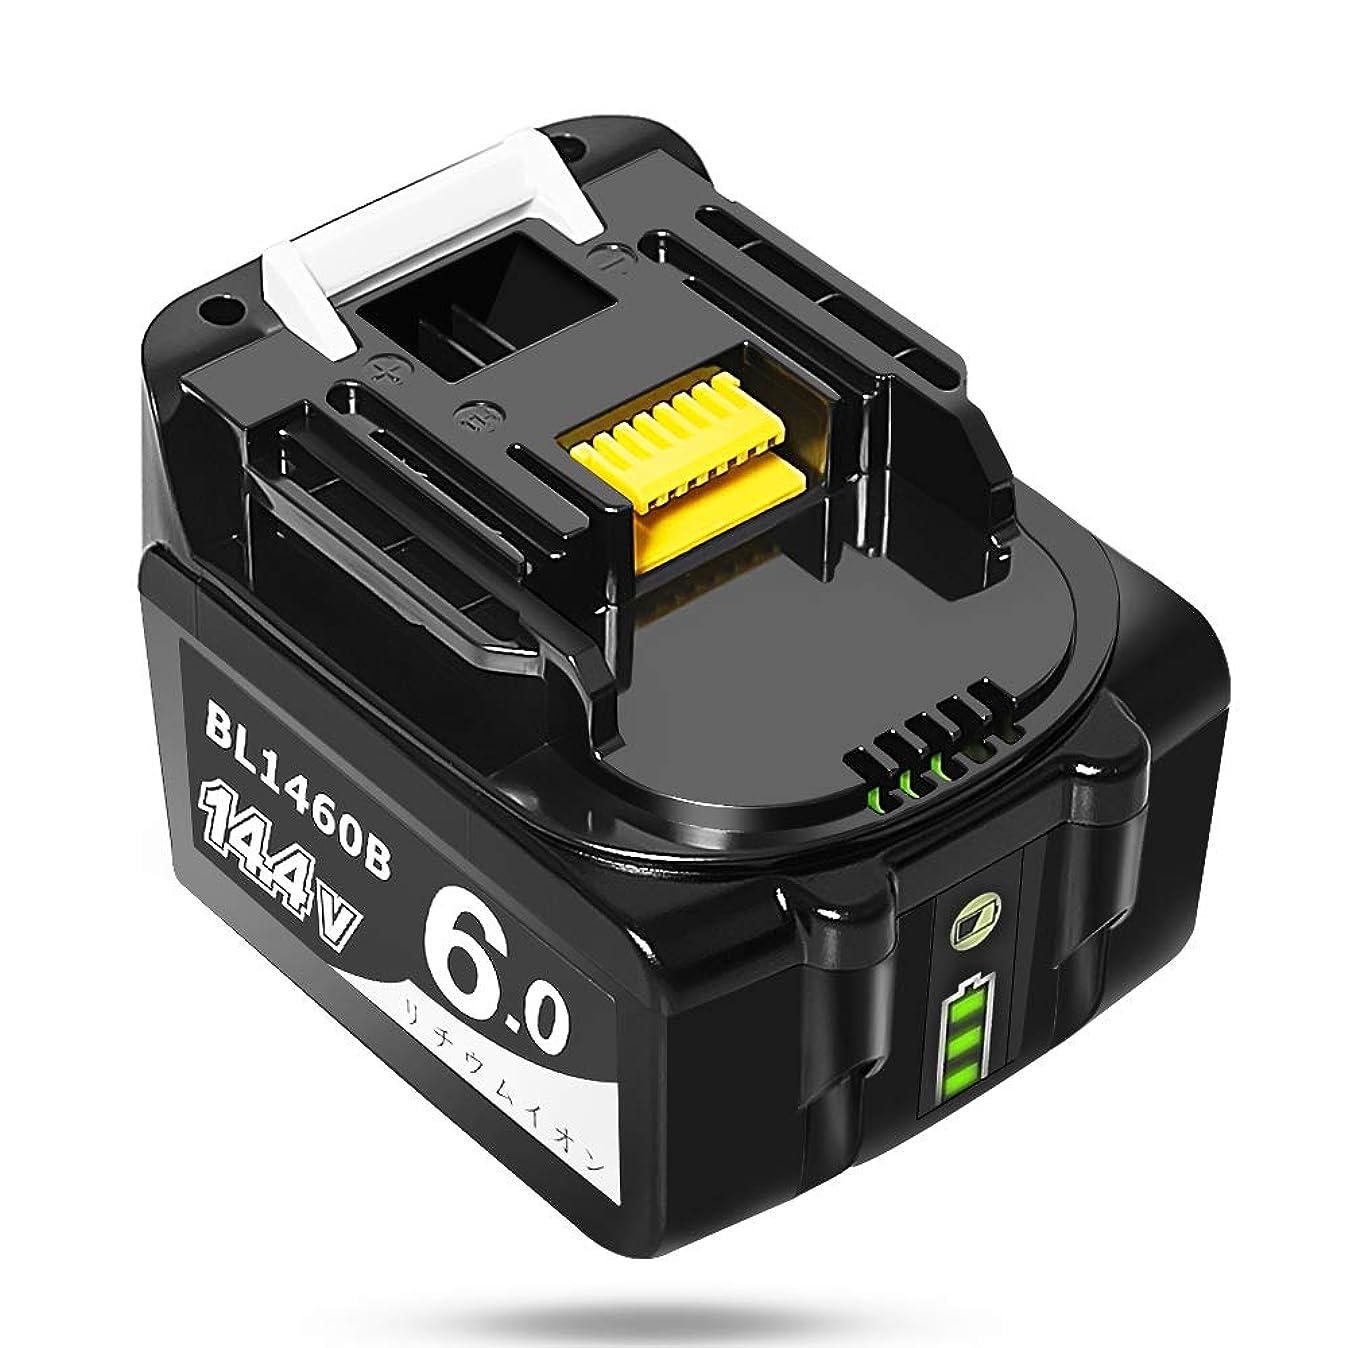 HFeng store マキタ 14.4v バッテリー BL1460B 互換 14.4v 6Ah BL1430 BL1440 BL1450 BL1460など対応